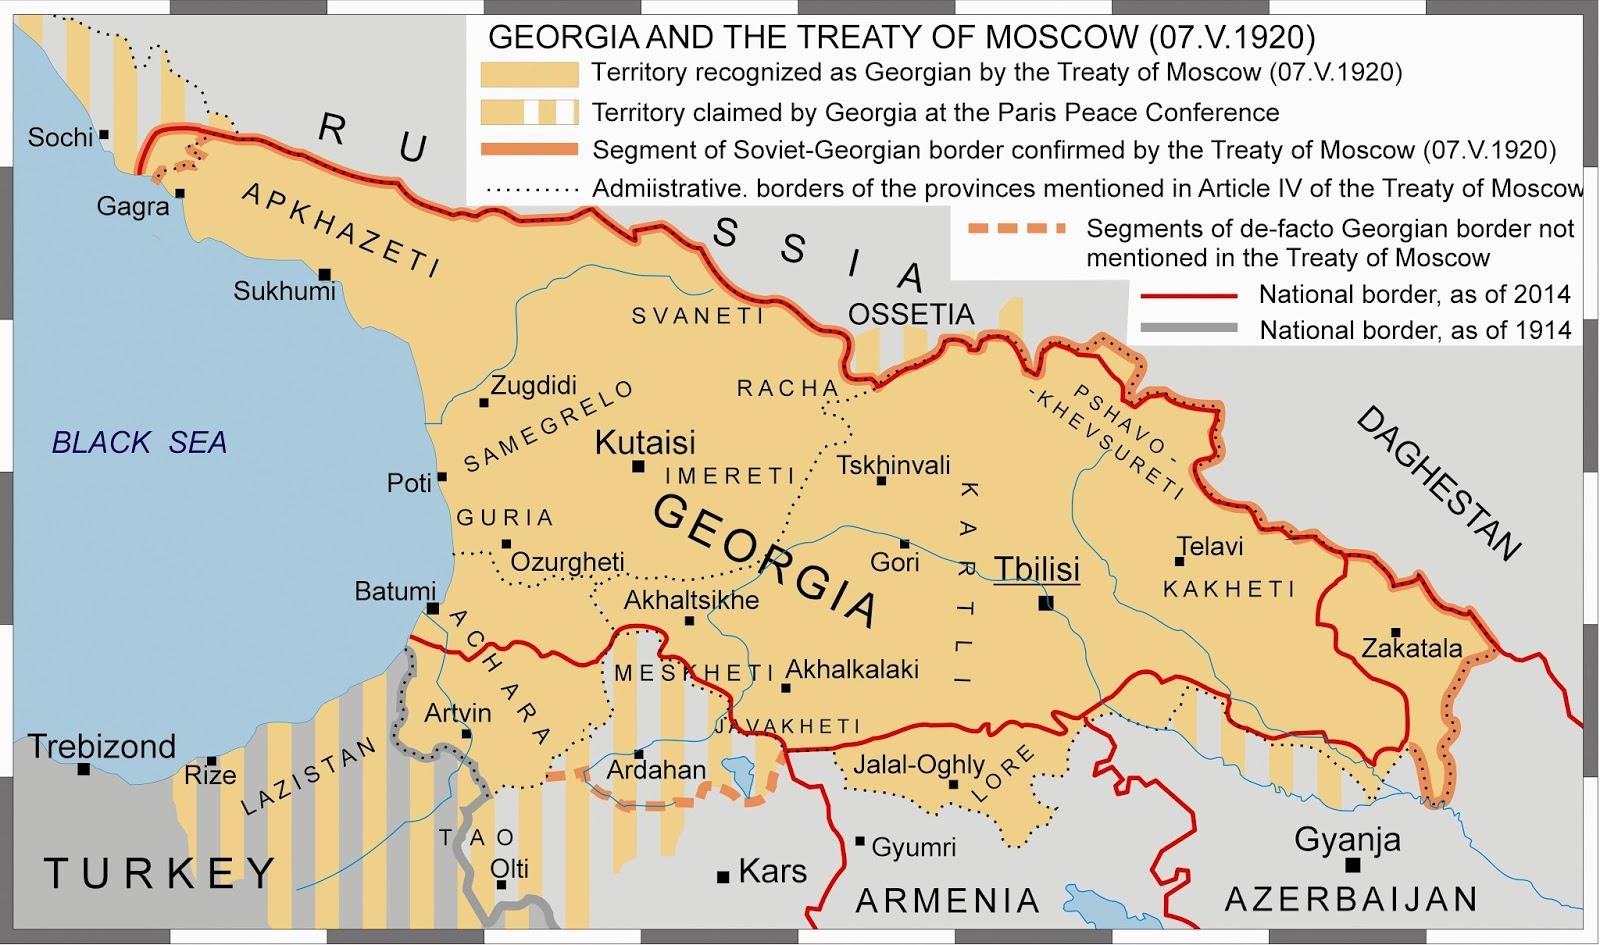 king john iii sobieski and the battle of vienna 12 09 1683 andrew andersen